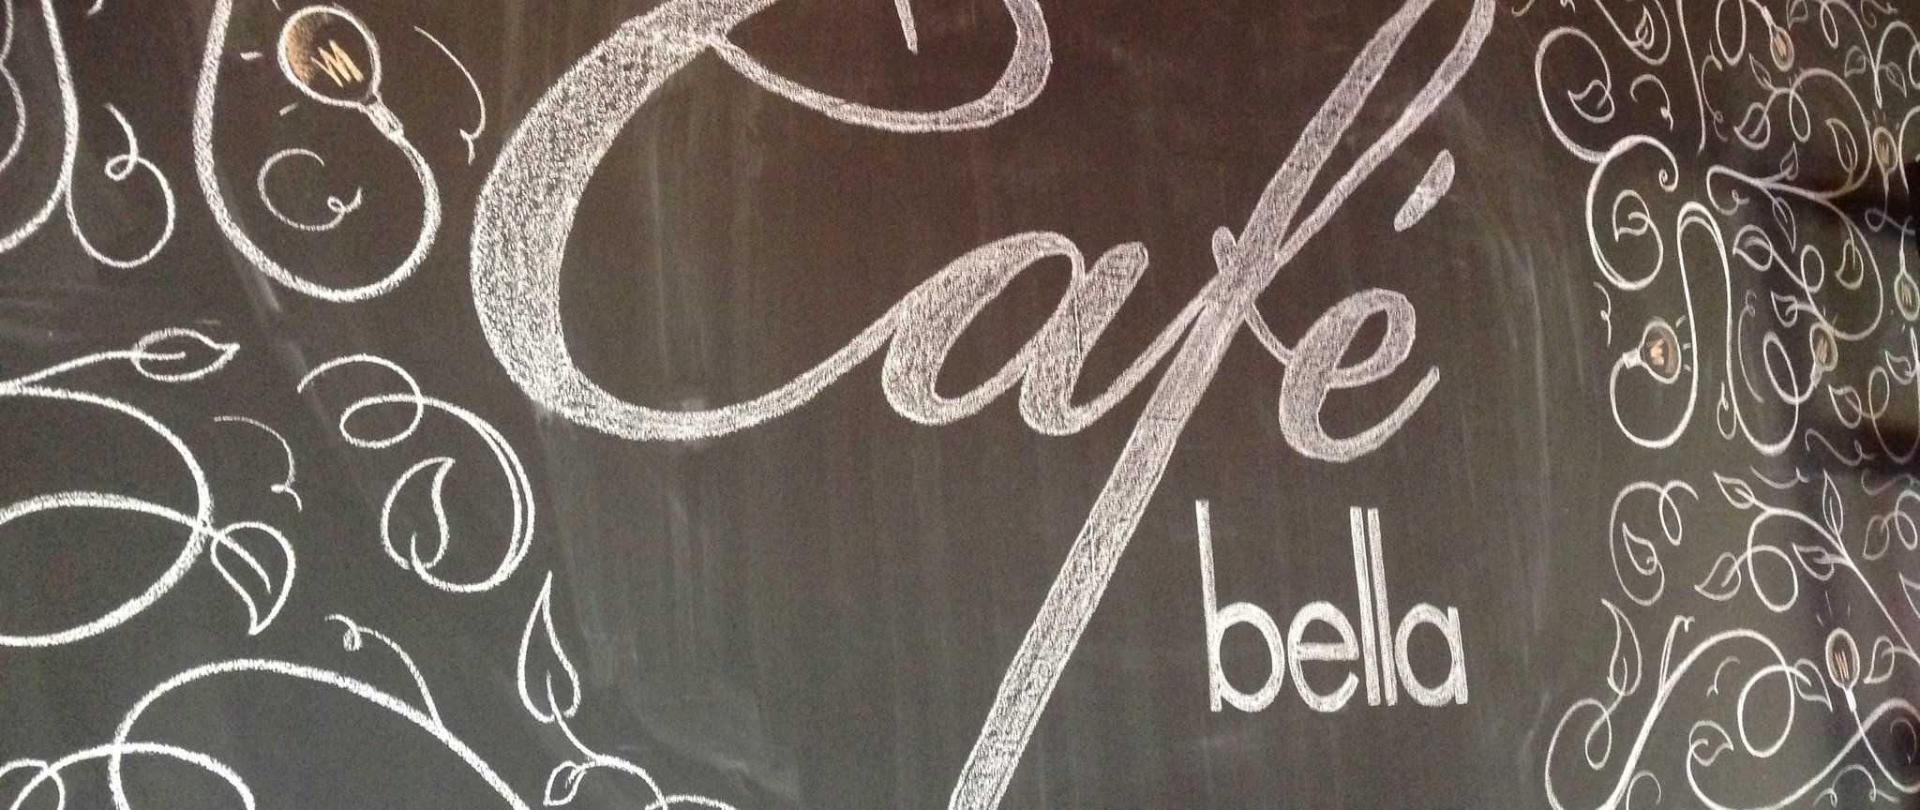 blackboard-2.jpg